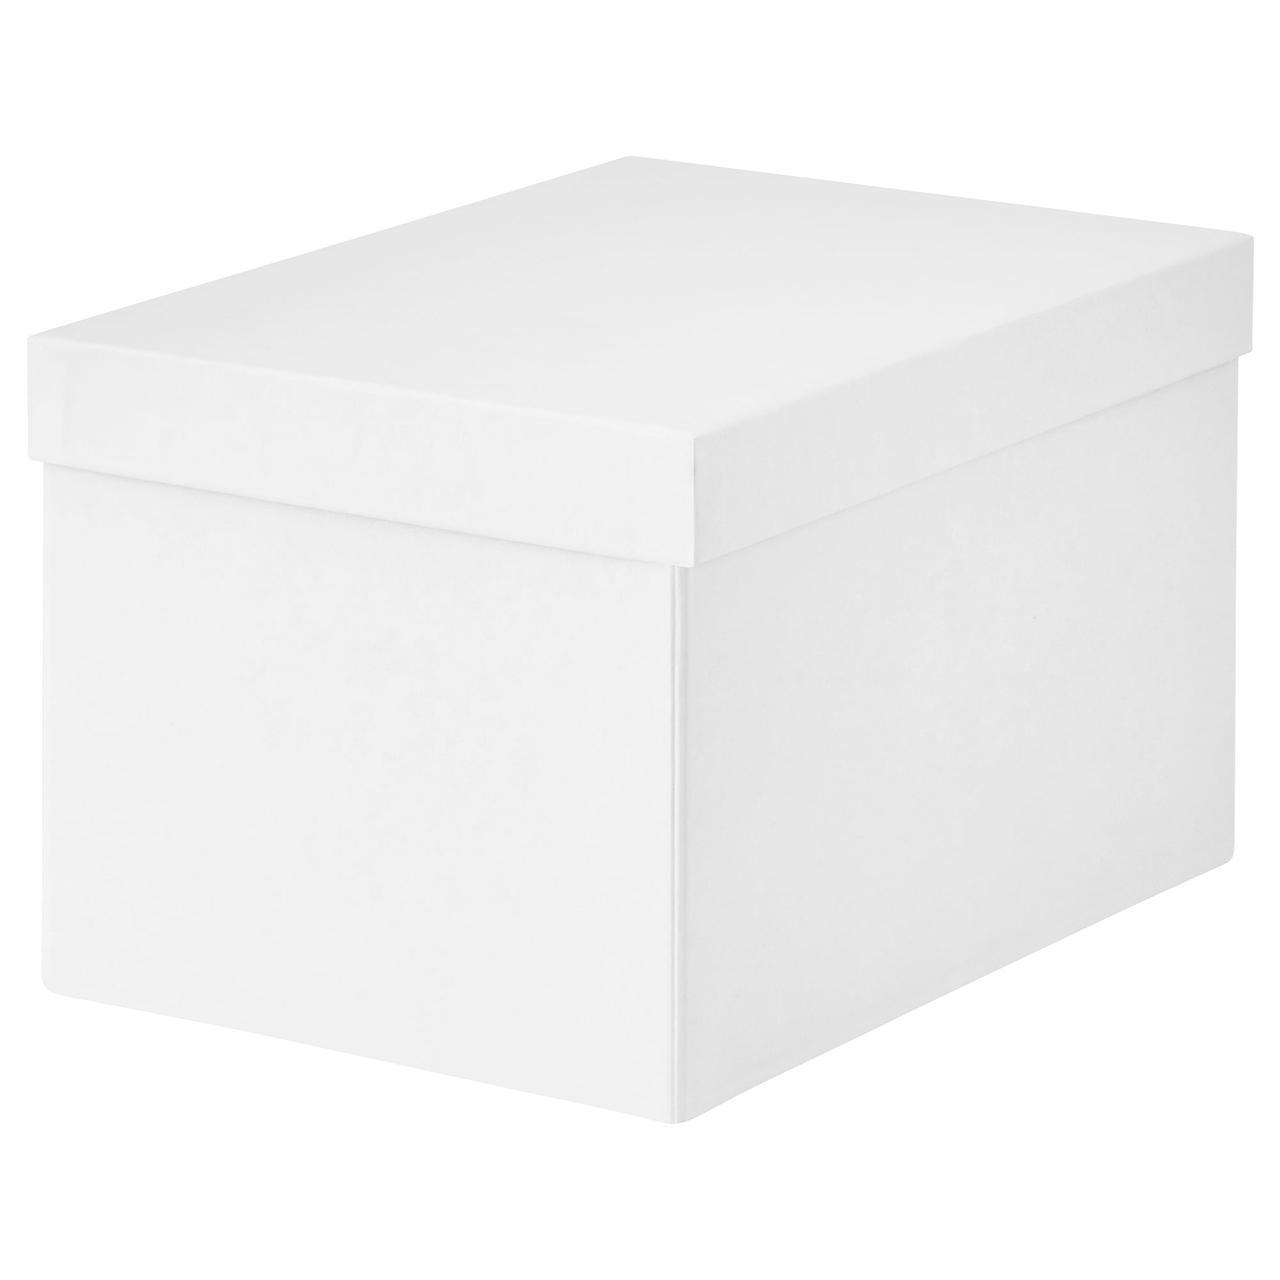 IKEA TJENA (103.954.21) Контейнер с крышкой, белый